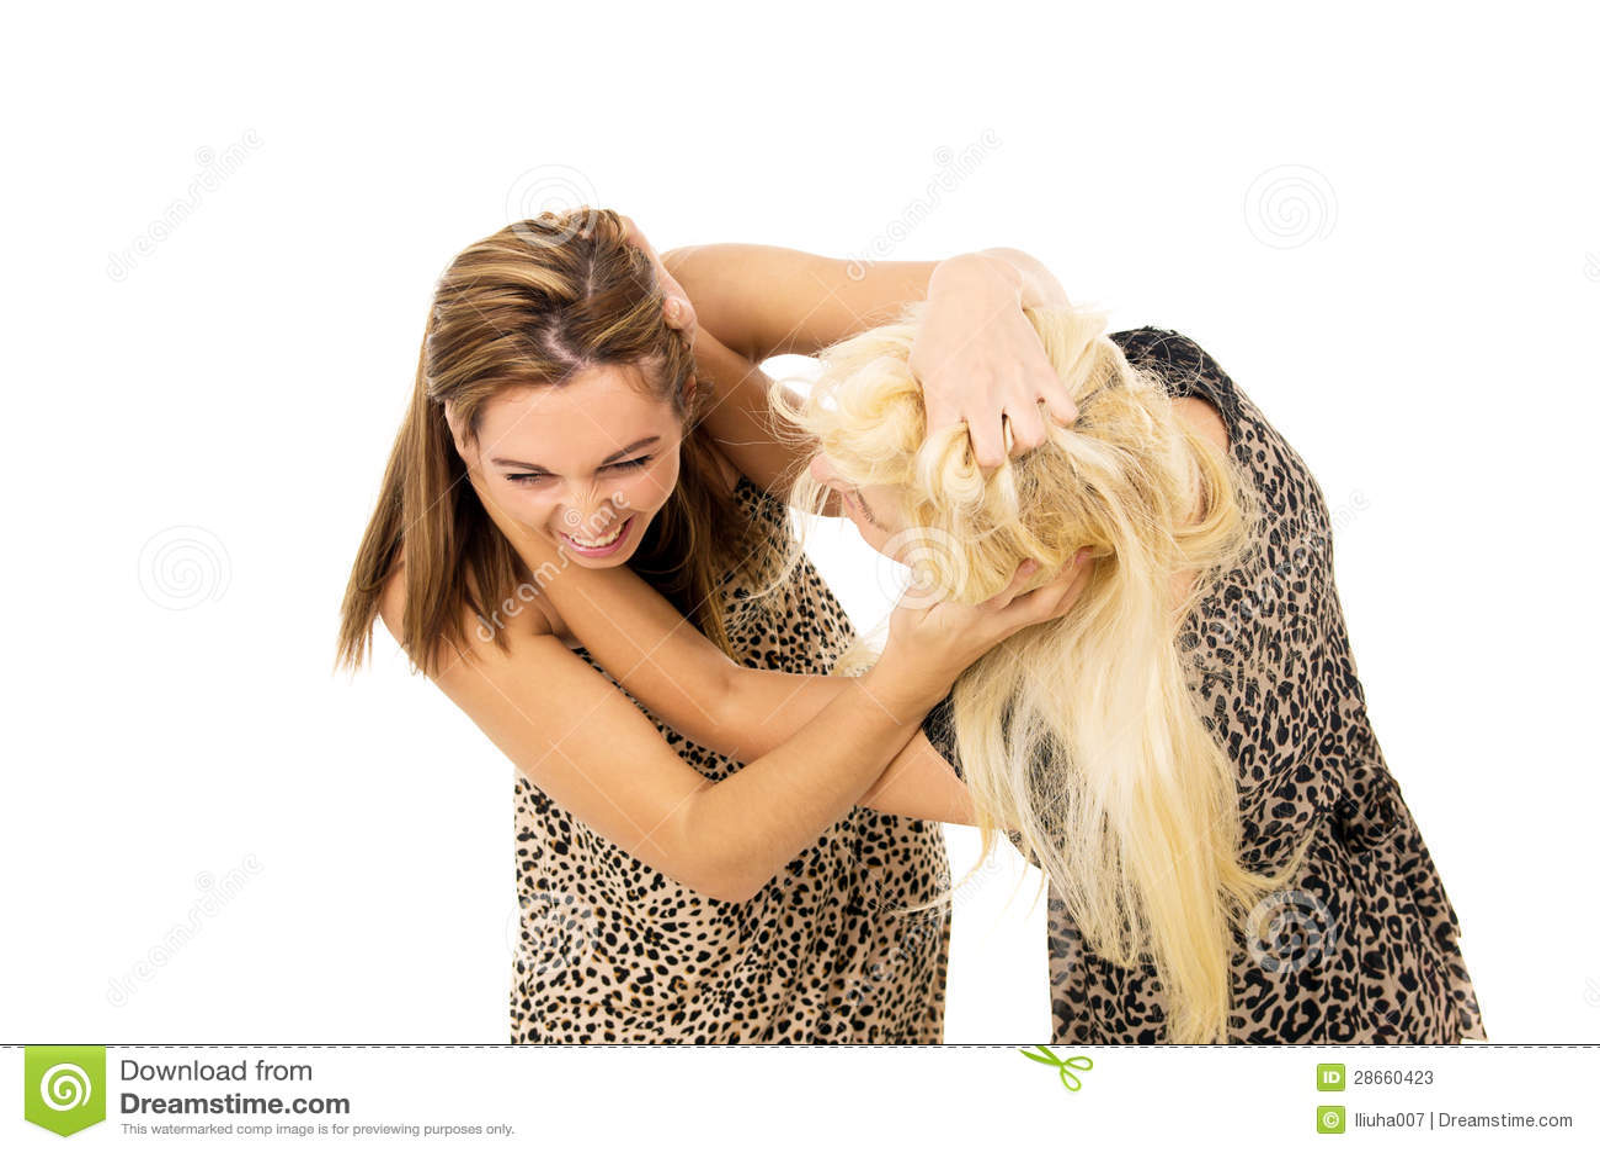 blonde girl fight